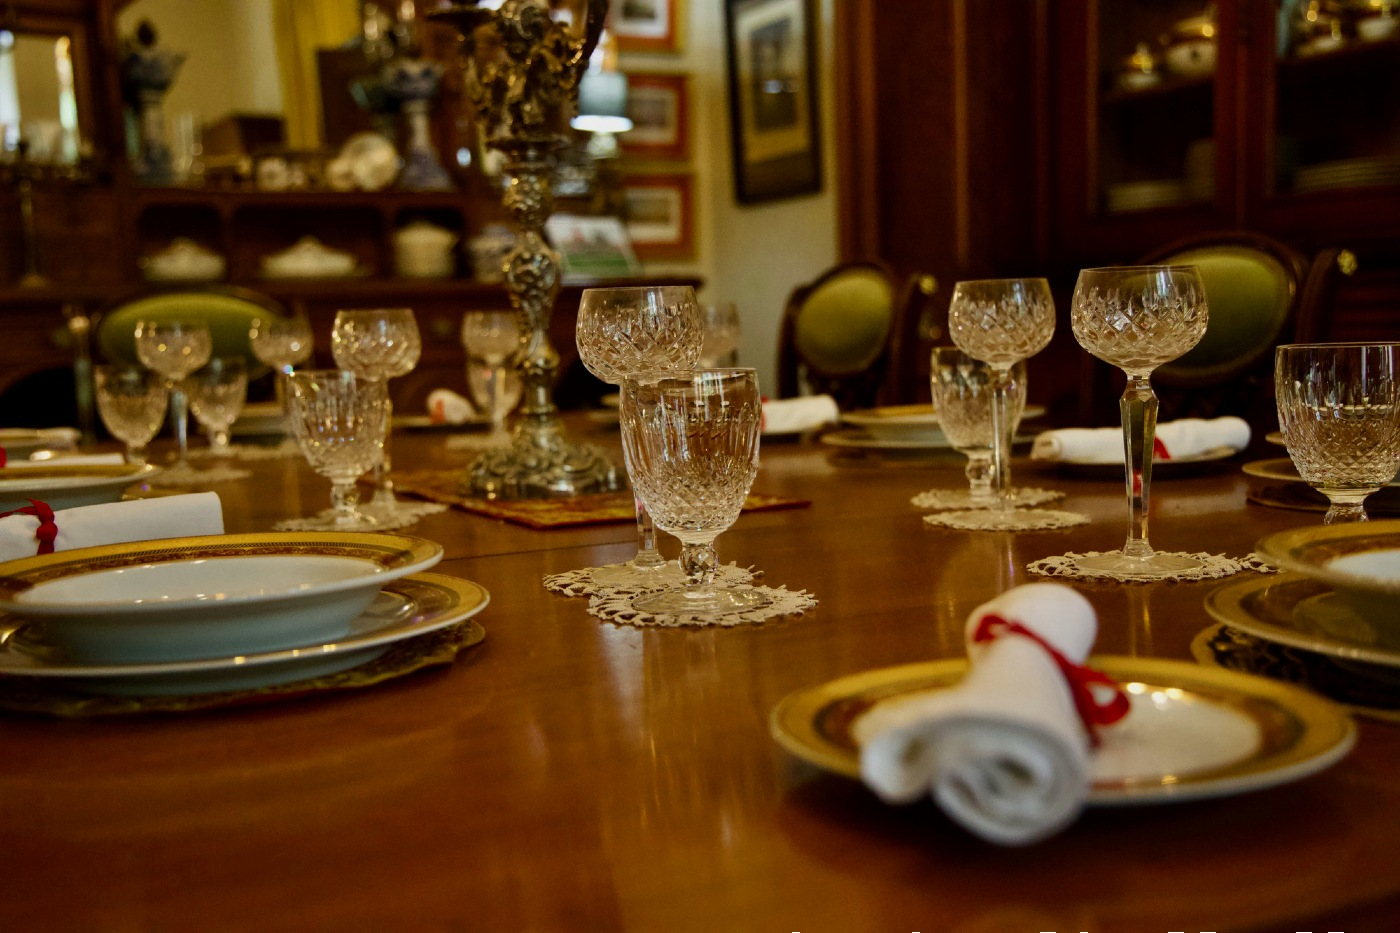 Historic Abercrombie House Dining Room Bathurst NSW